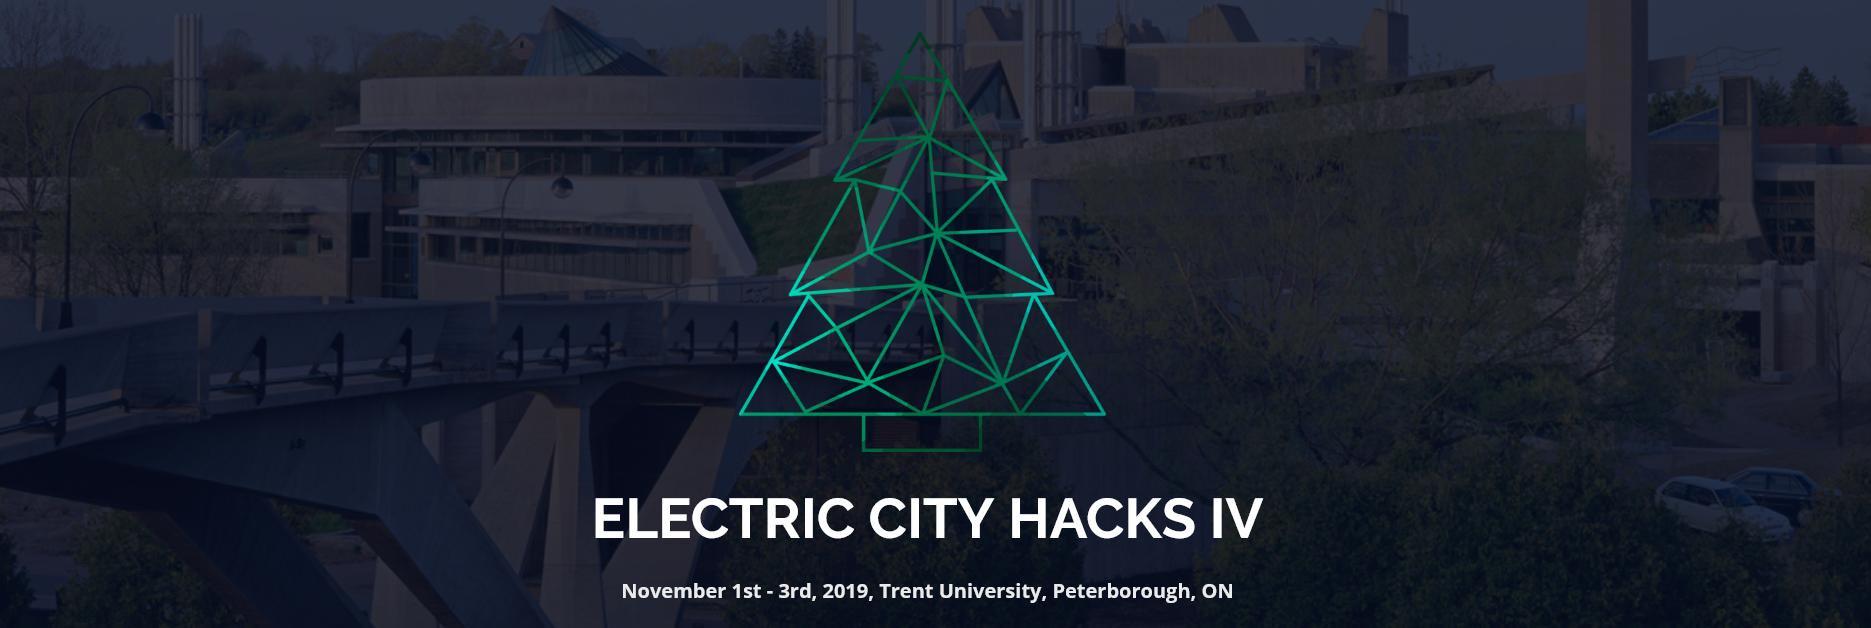 Electric City Hacks Returns This November